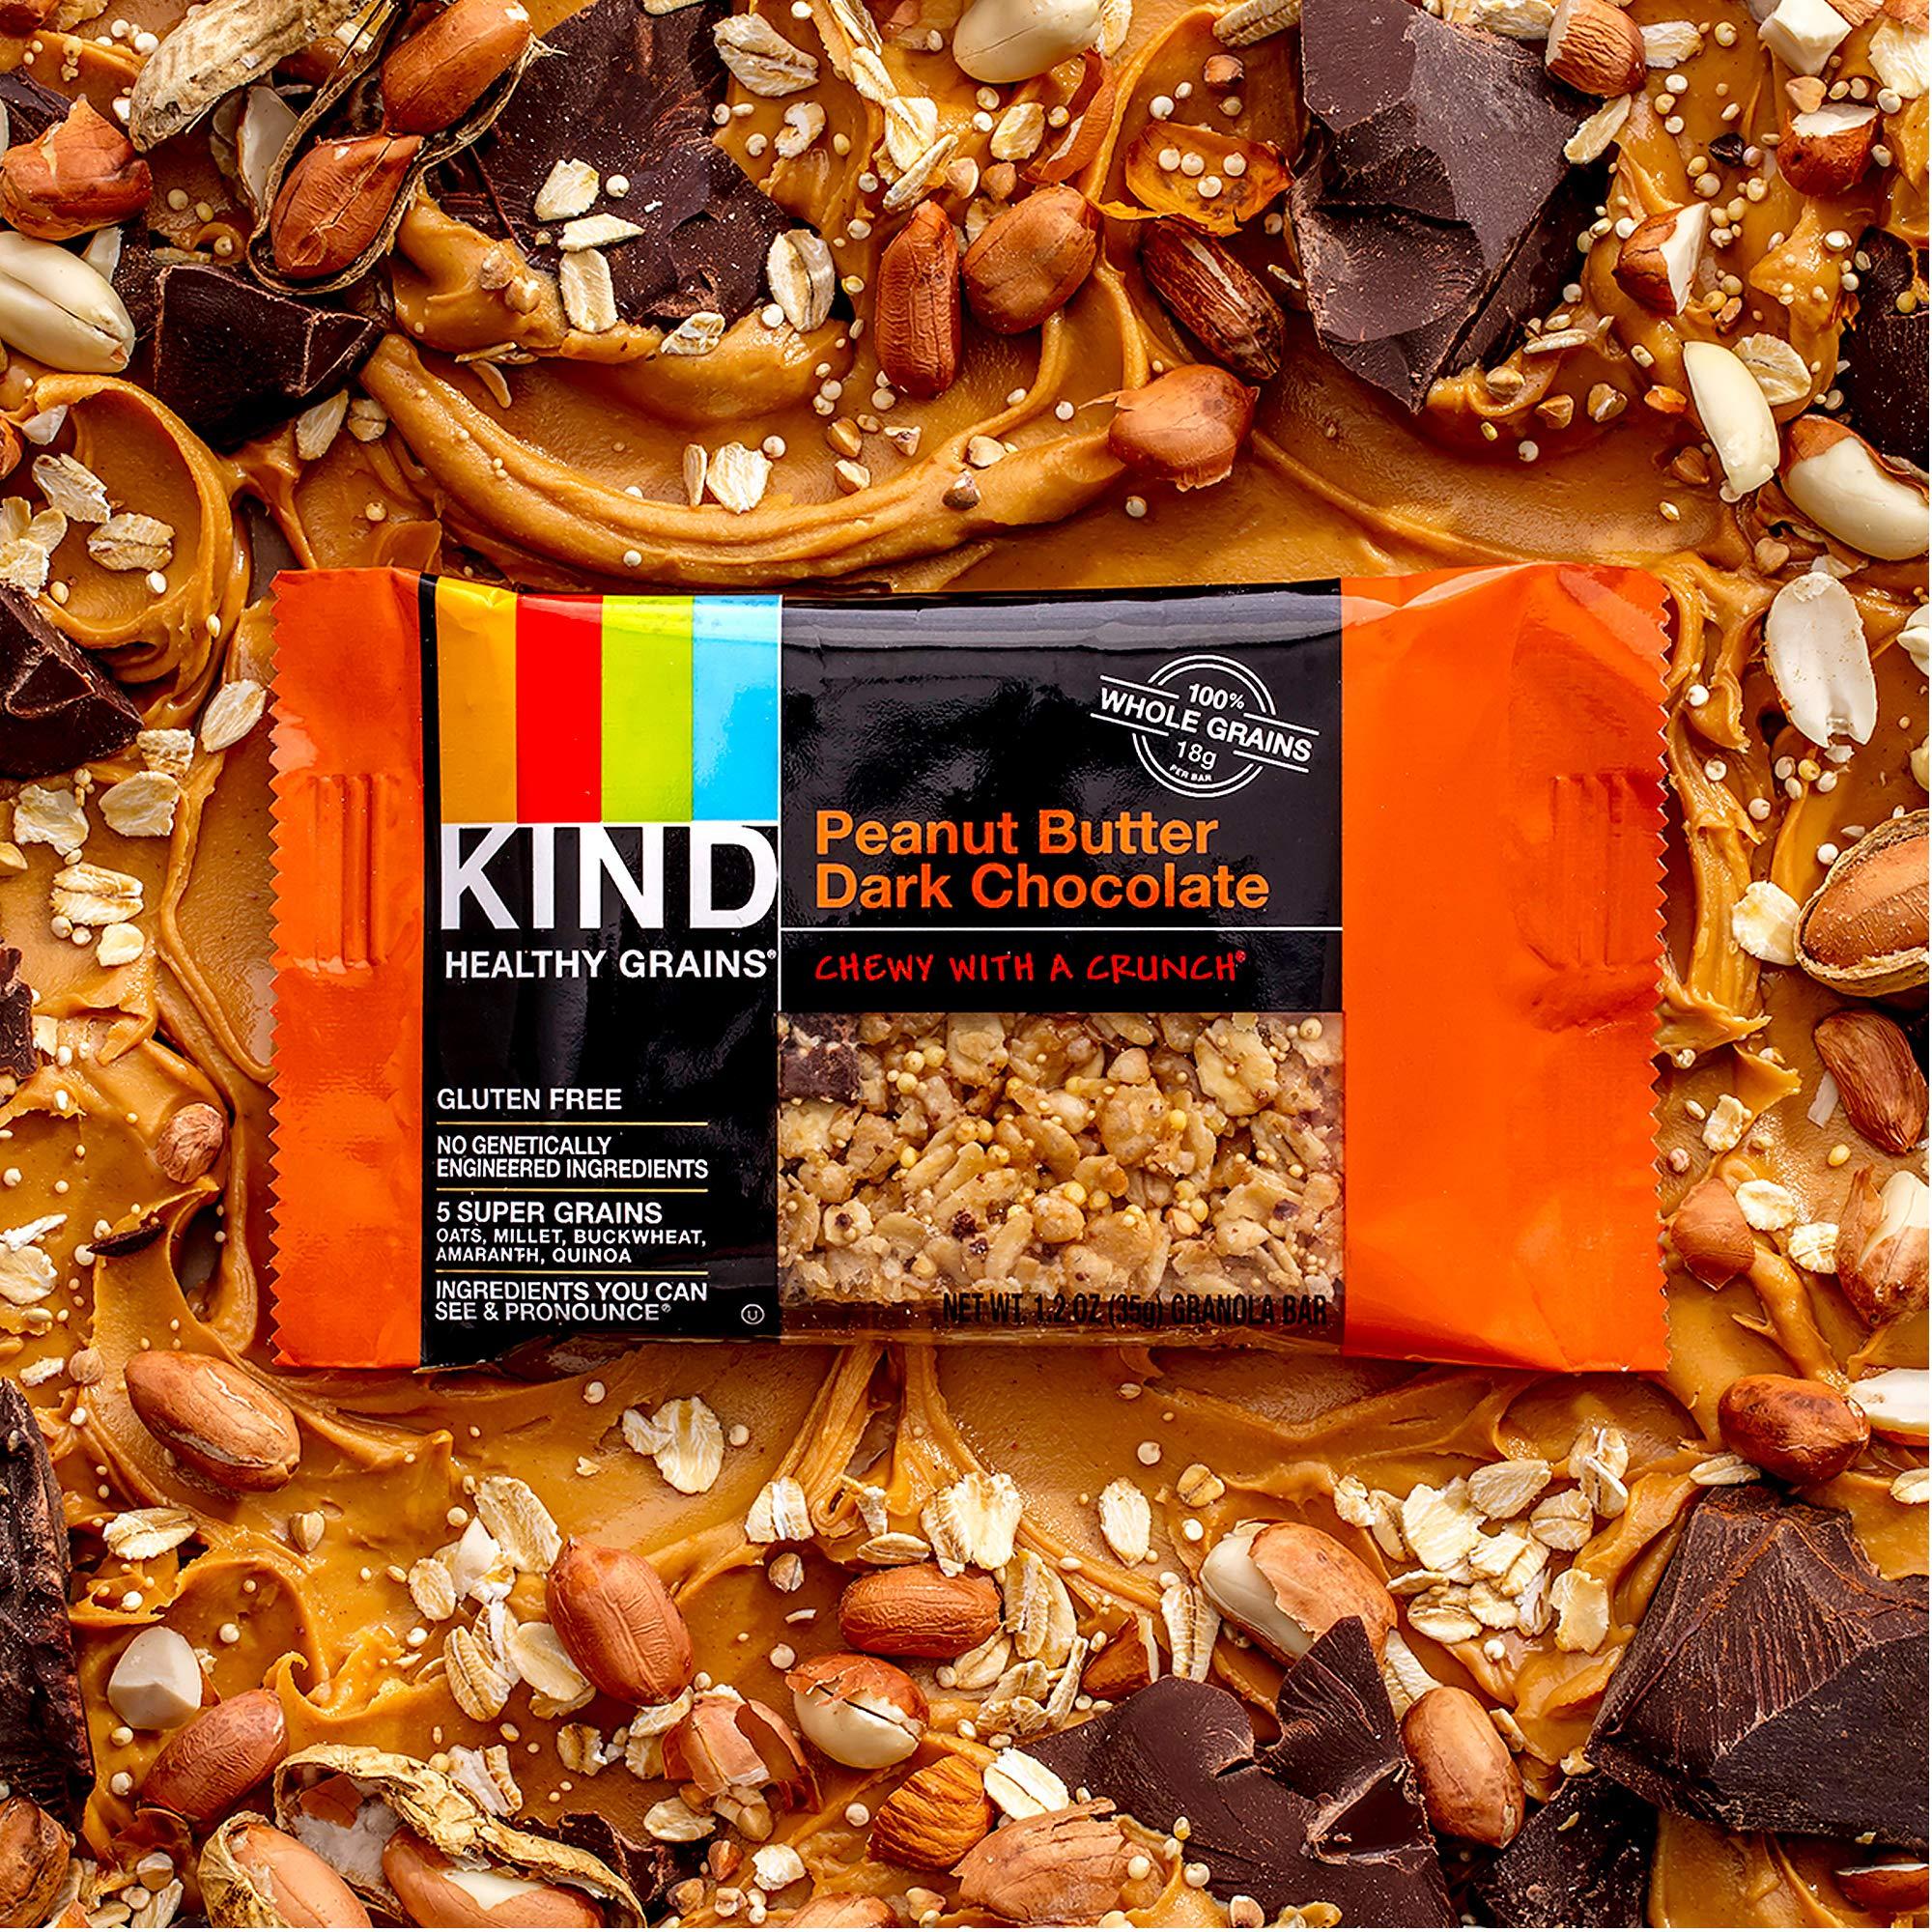 KIND Healthy Grains Granola Bars, Peanut Butter Dark Chocolate, Gluten Free, 1.2 oz, 30 Count by KIND (Image #4)